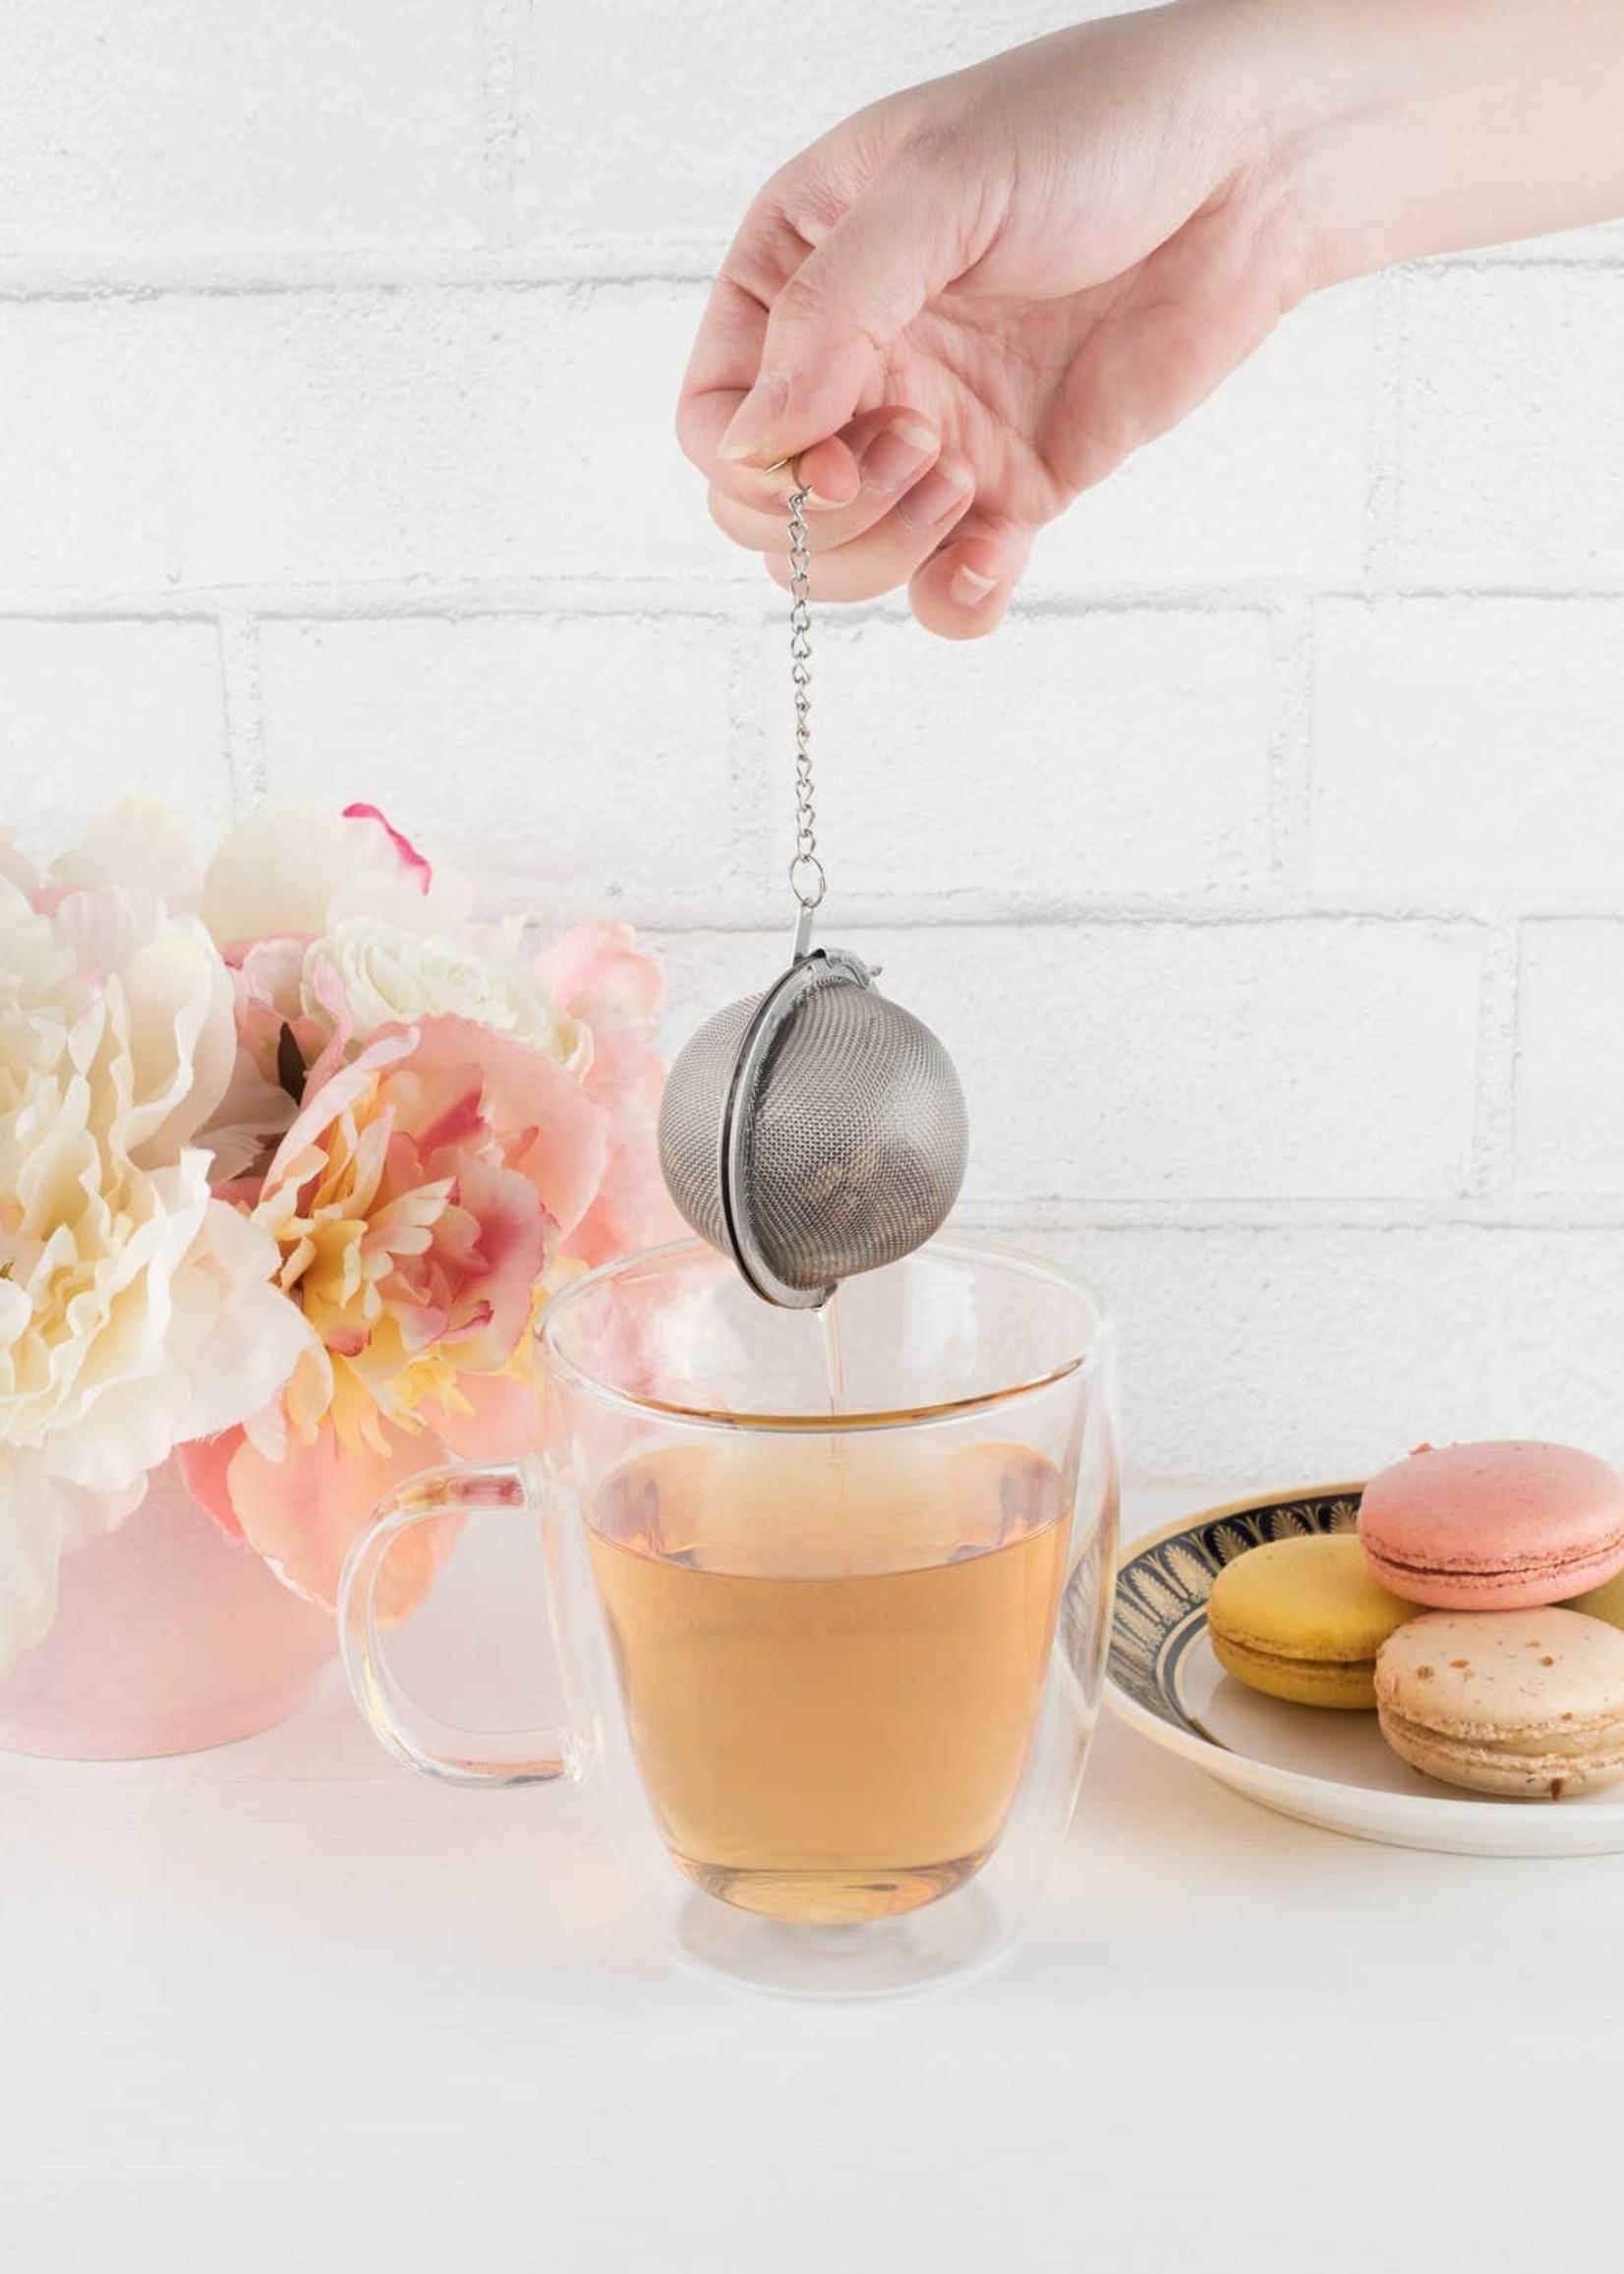 Stainless Steel Tea Infuser - Ball